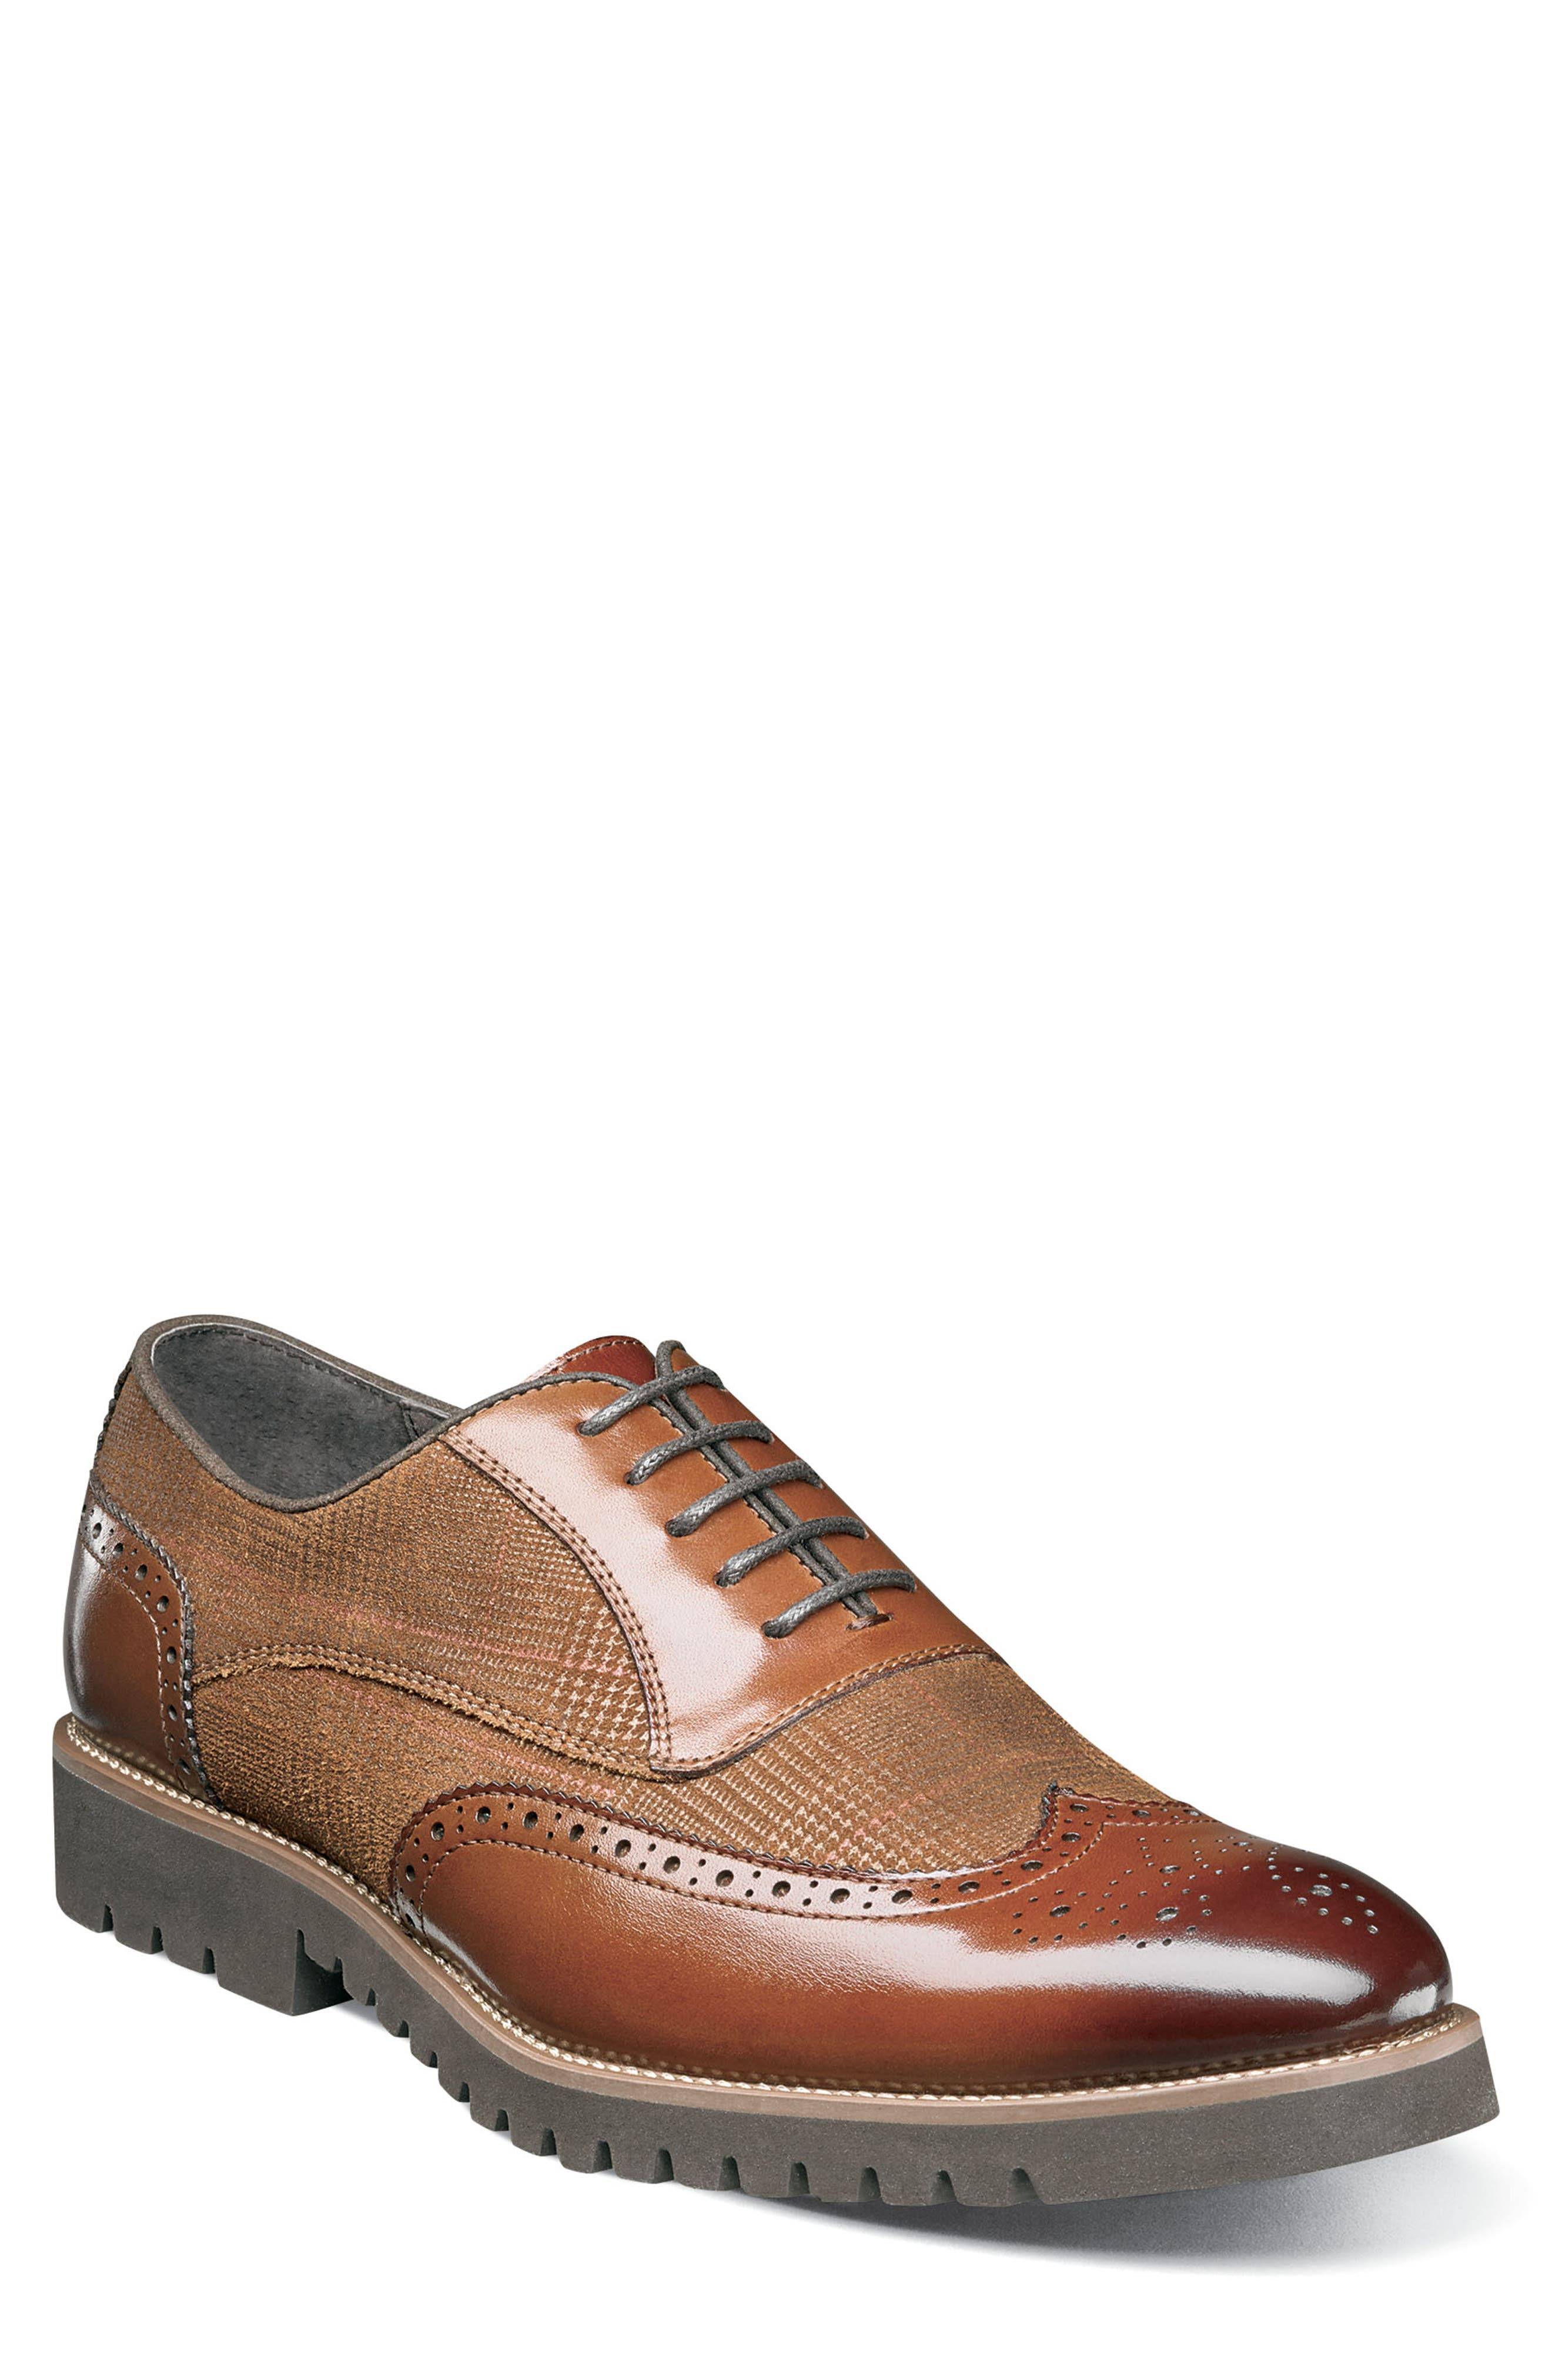 Mens Vintage Style Shoes & Boots| Retro Classic Shoes Mens Stacy Adams Baxley Glen Plaid Wingtip Size 14 M - Brown $105.00 AT vintagedancer.com